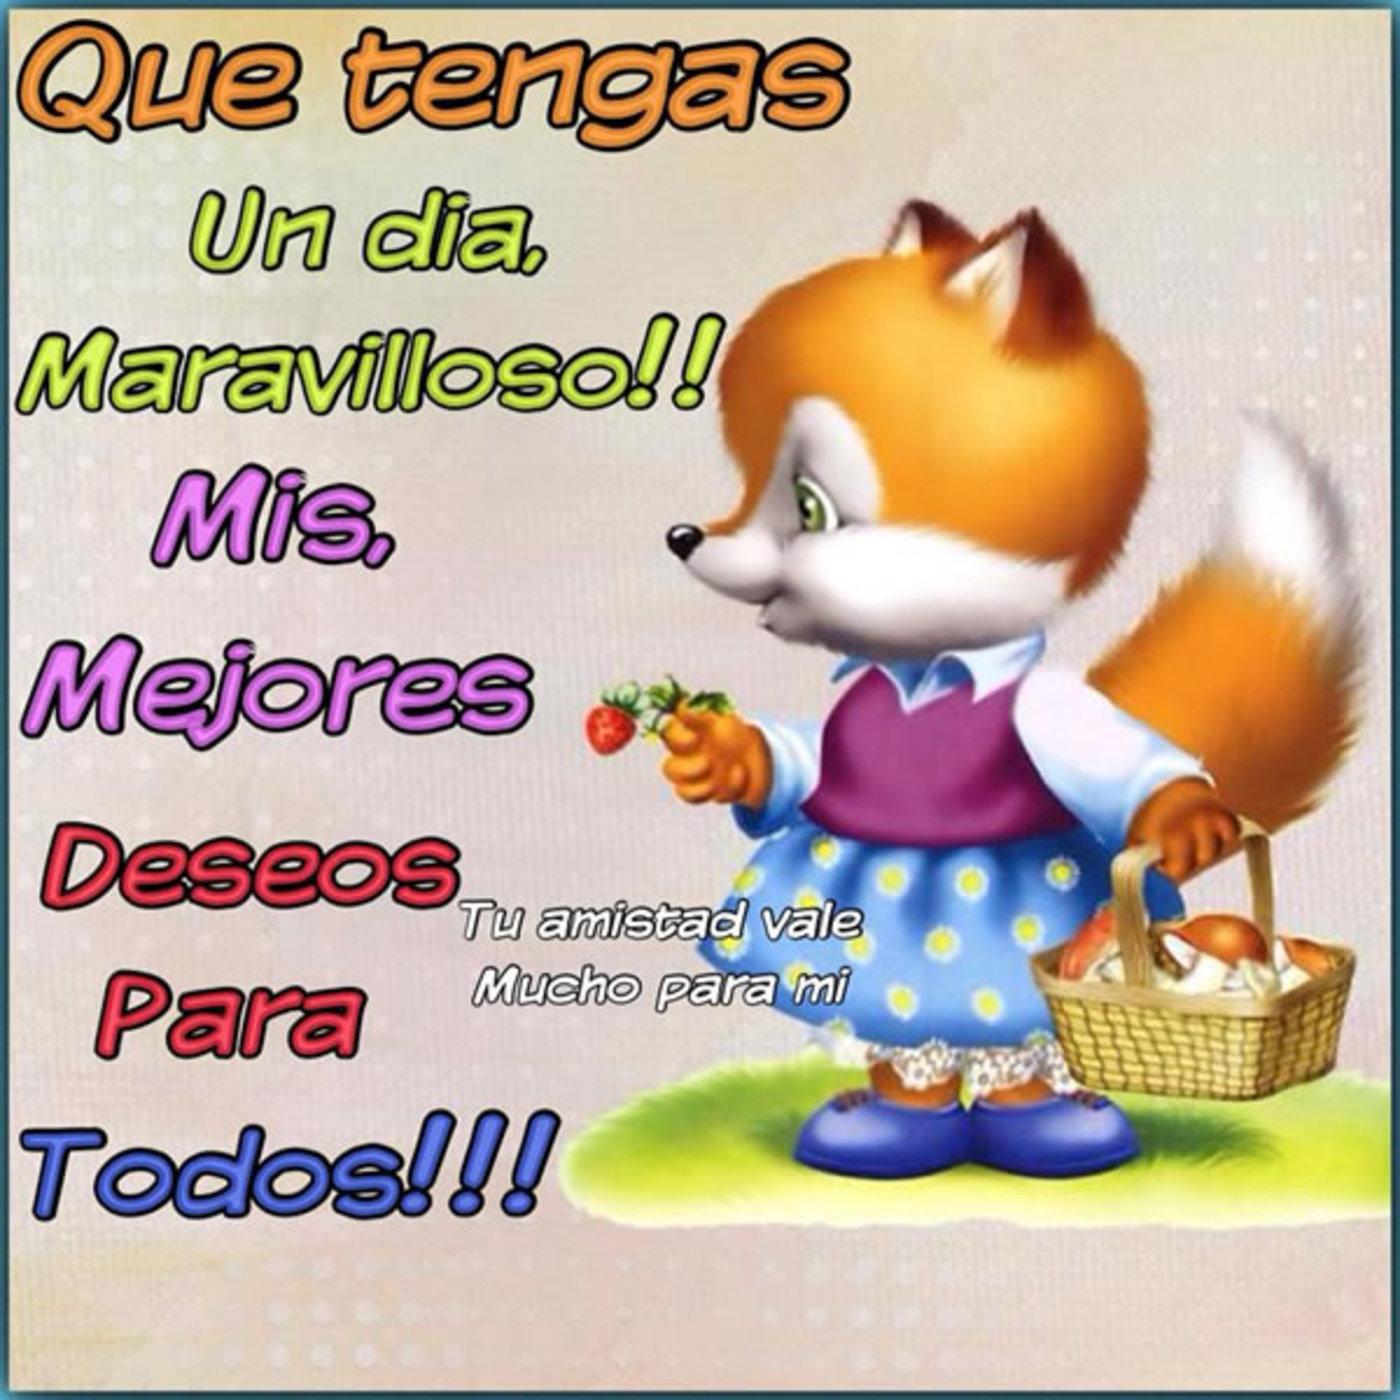 Que tengas un dia maravilloso. Mis mejores, deseo para todos!!!